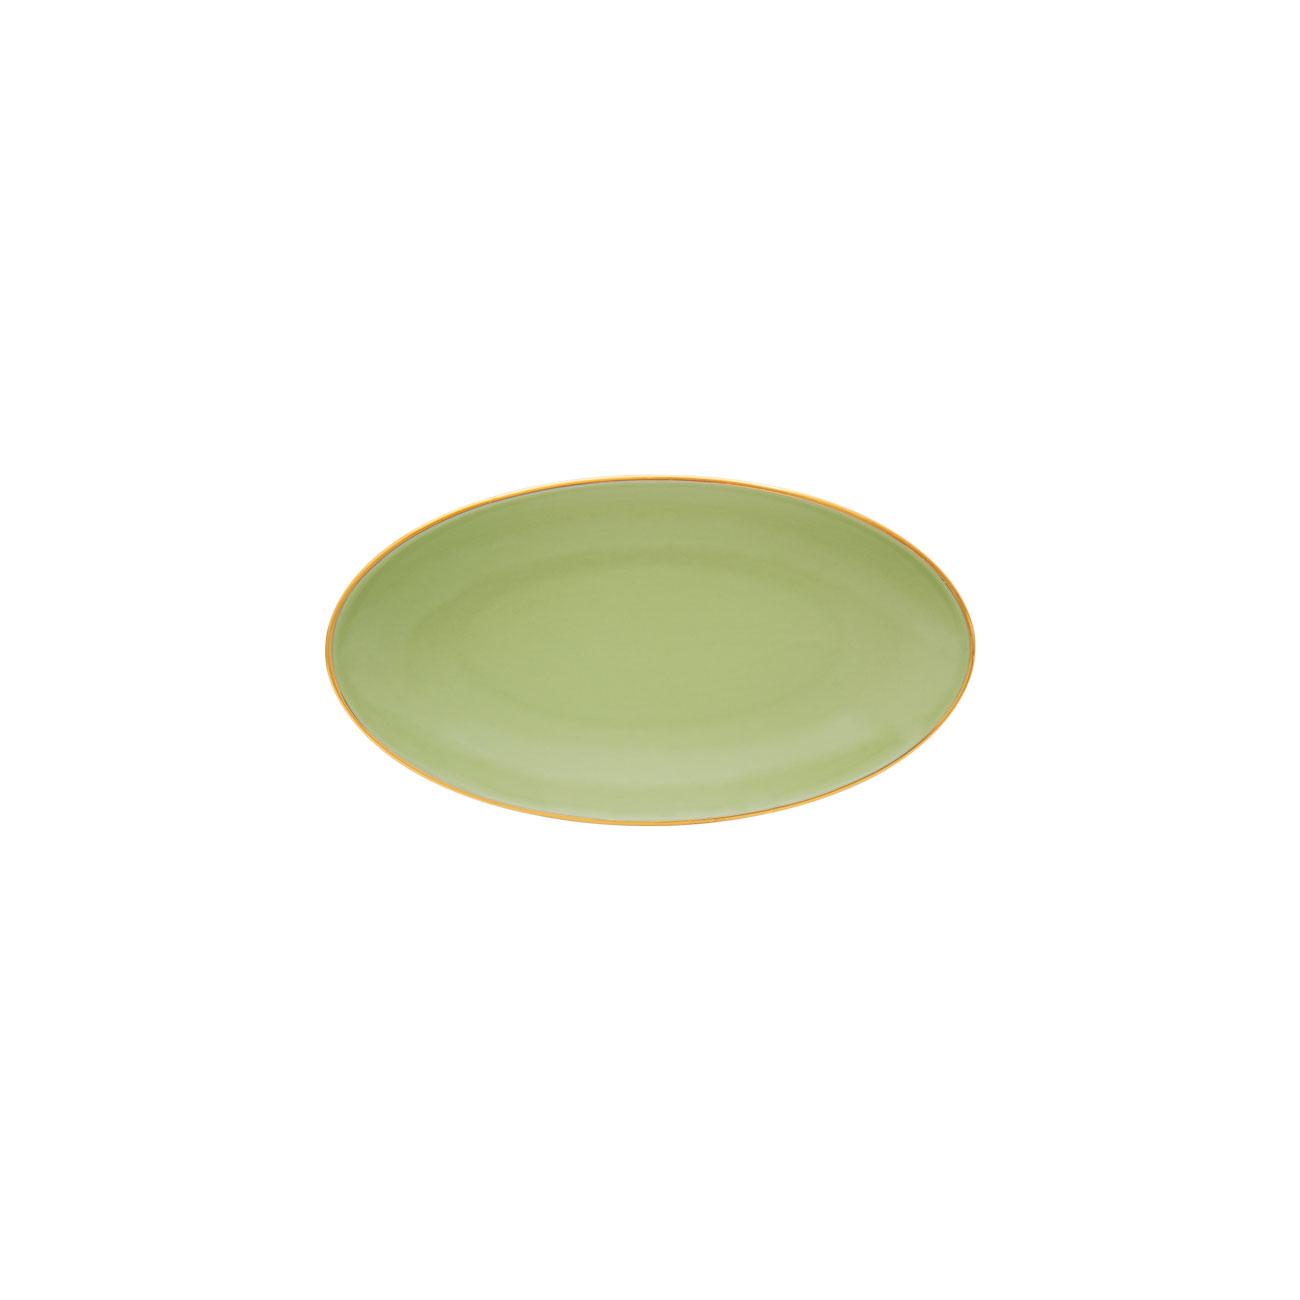 Oval Pickle Dish 20cm Olympus 1